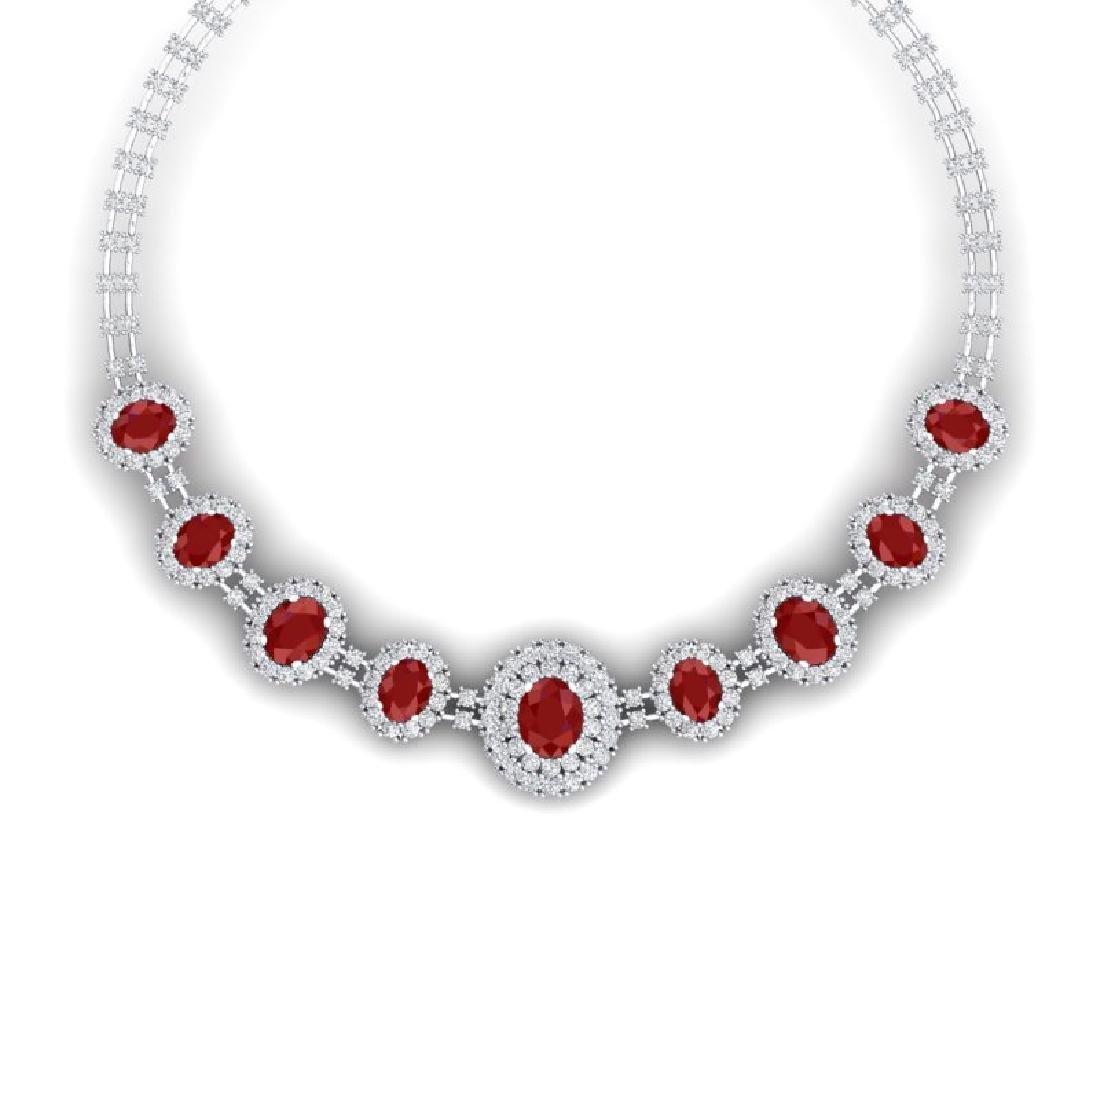 45.69 CTW Royalty Ruby & VS Diamond Necklace 18K White